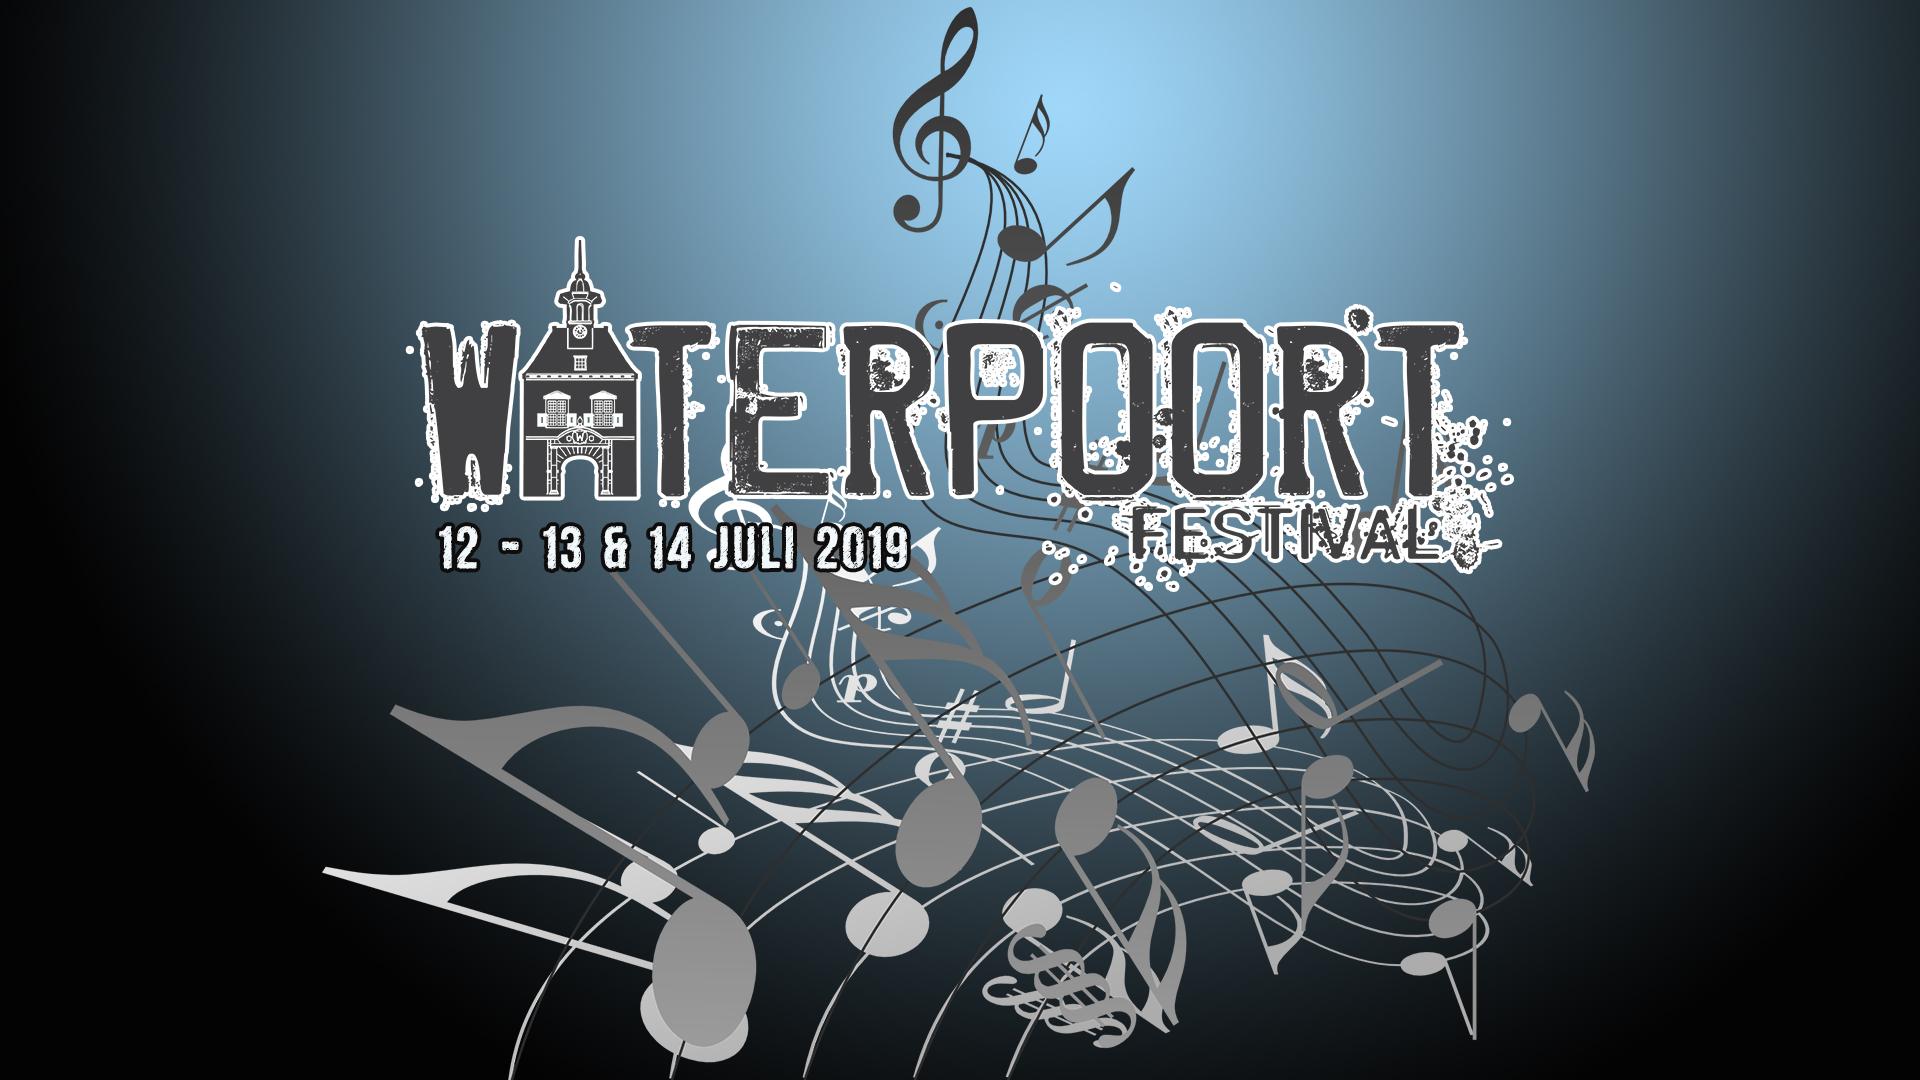 Waterpoortfestival stopt